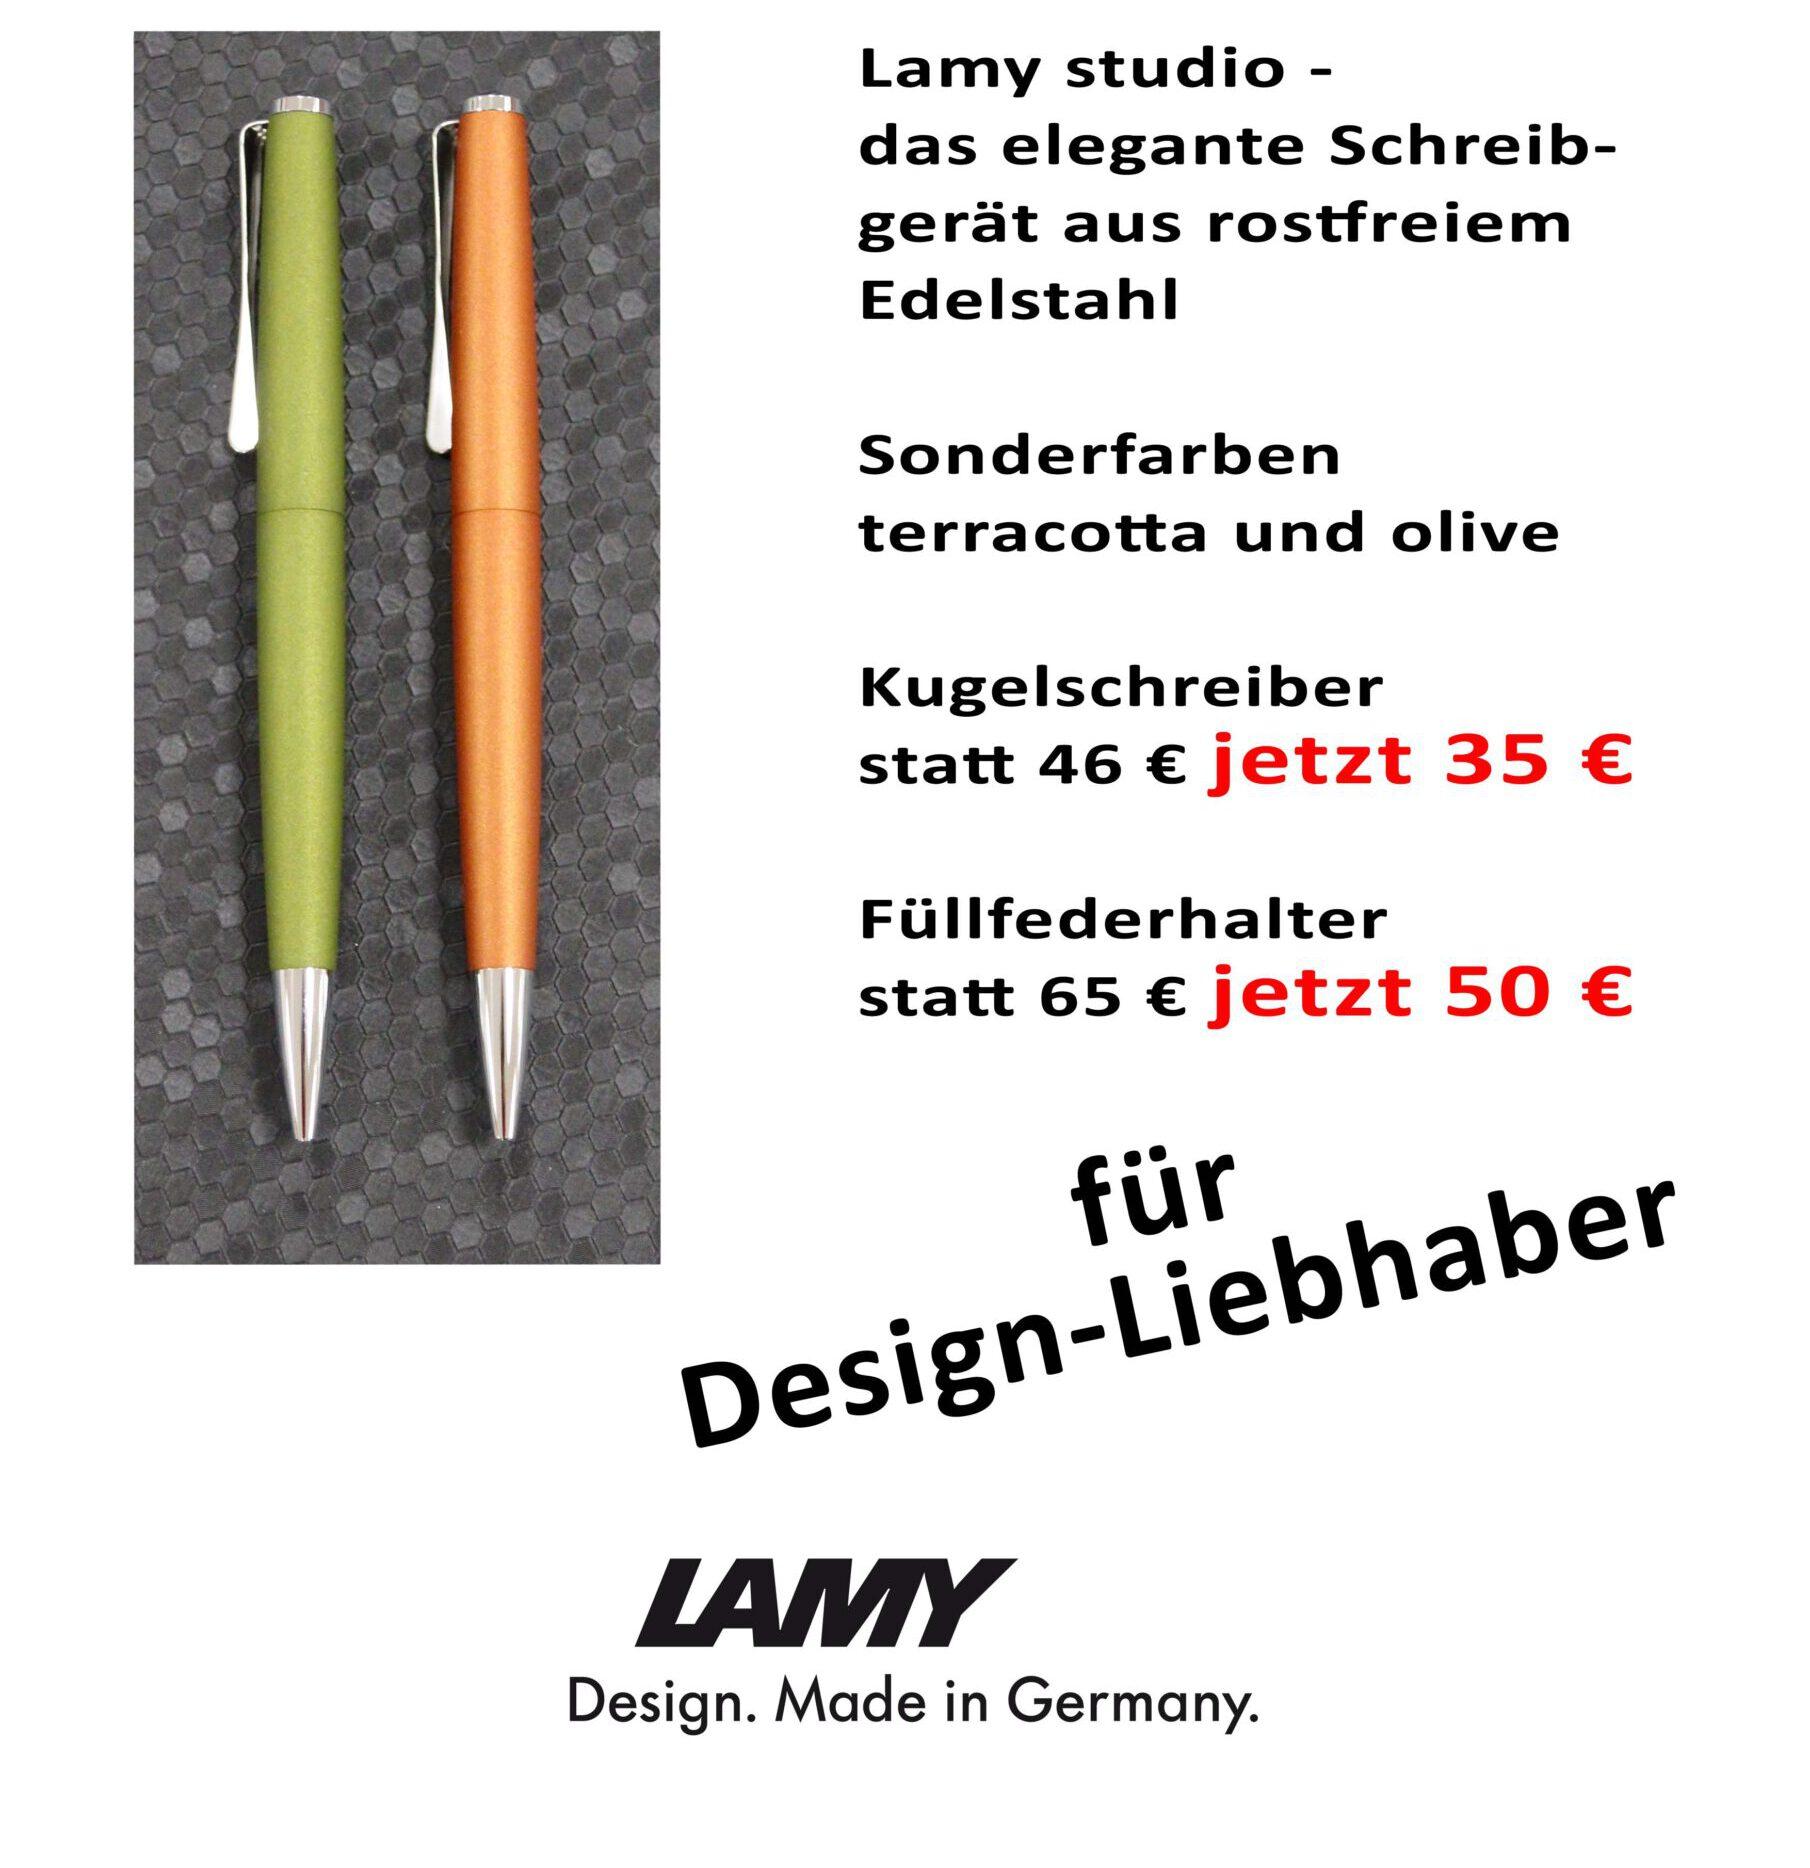 Lamy studio olive terracotta Angebot Driemeier